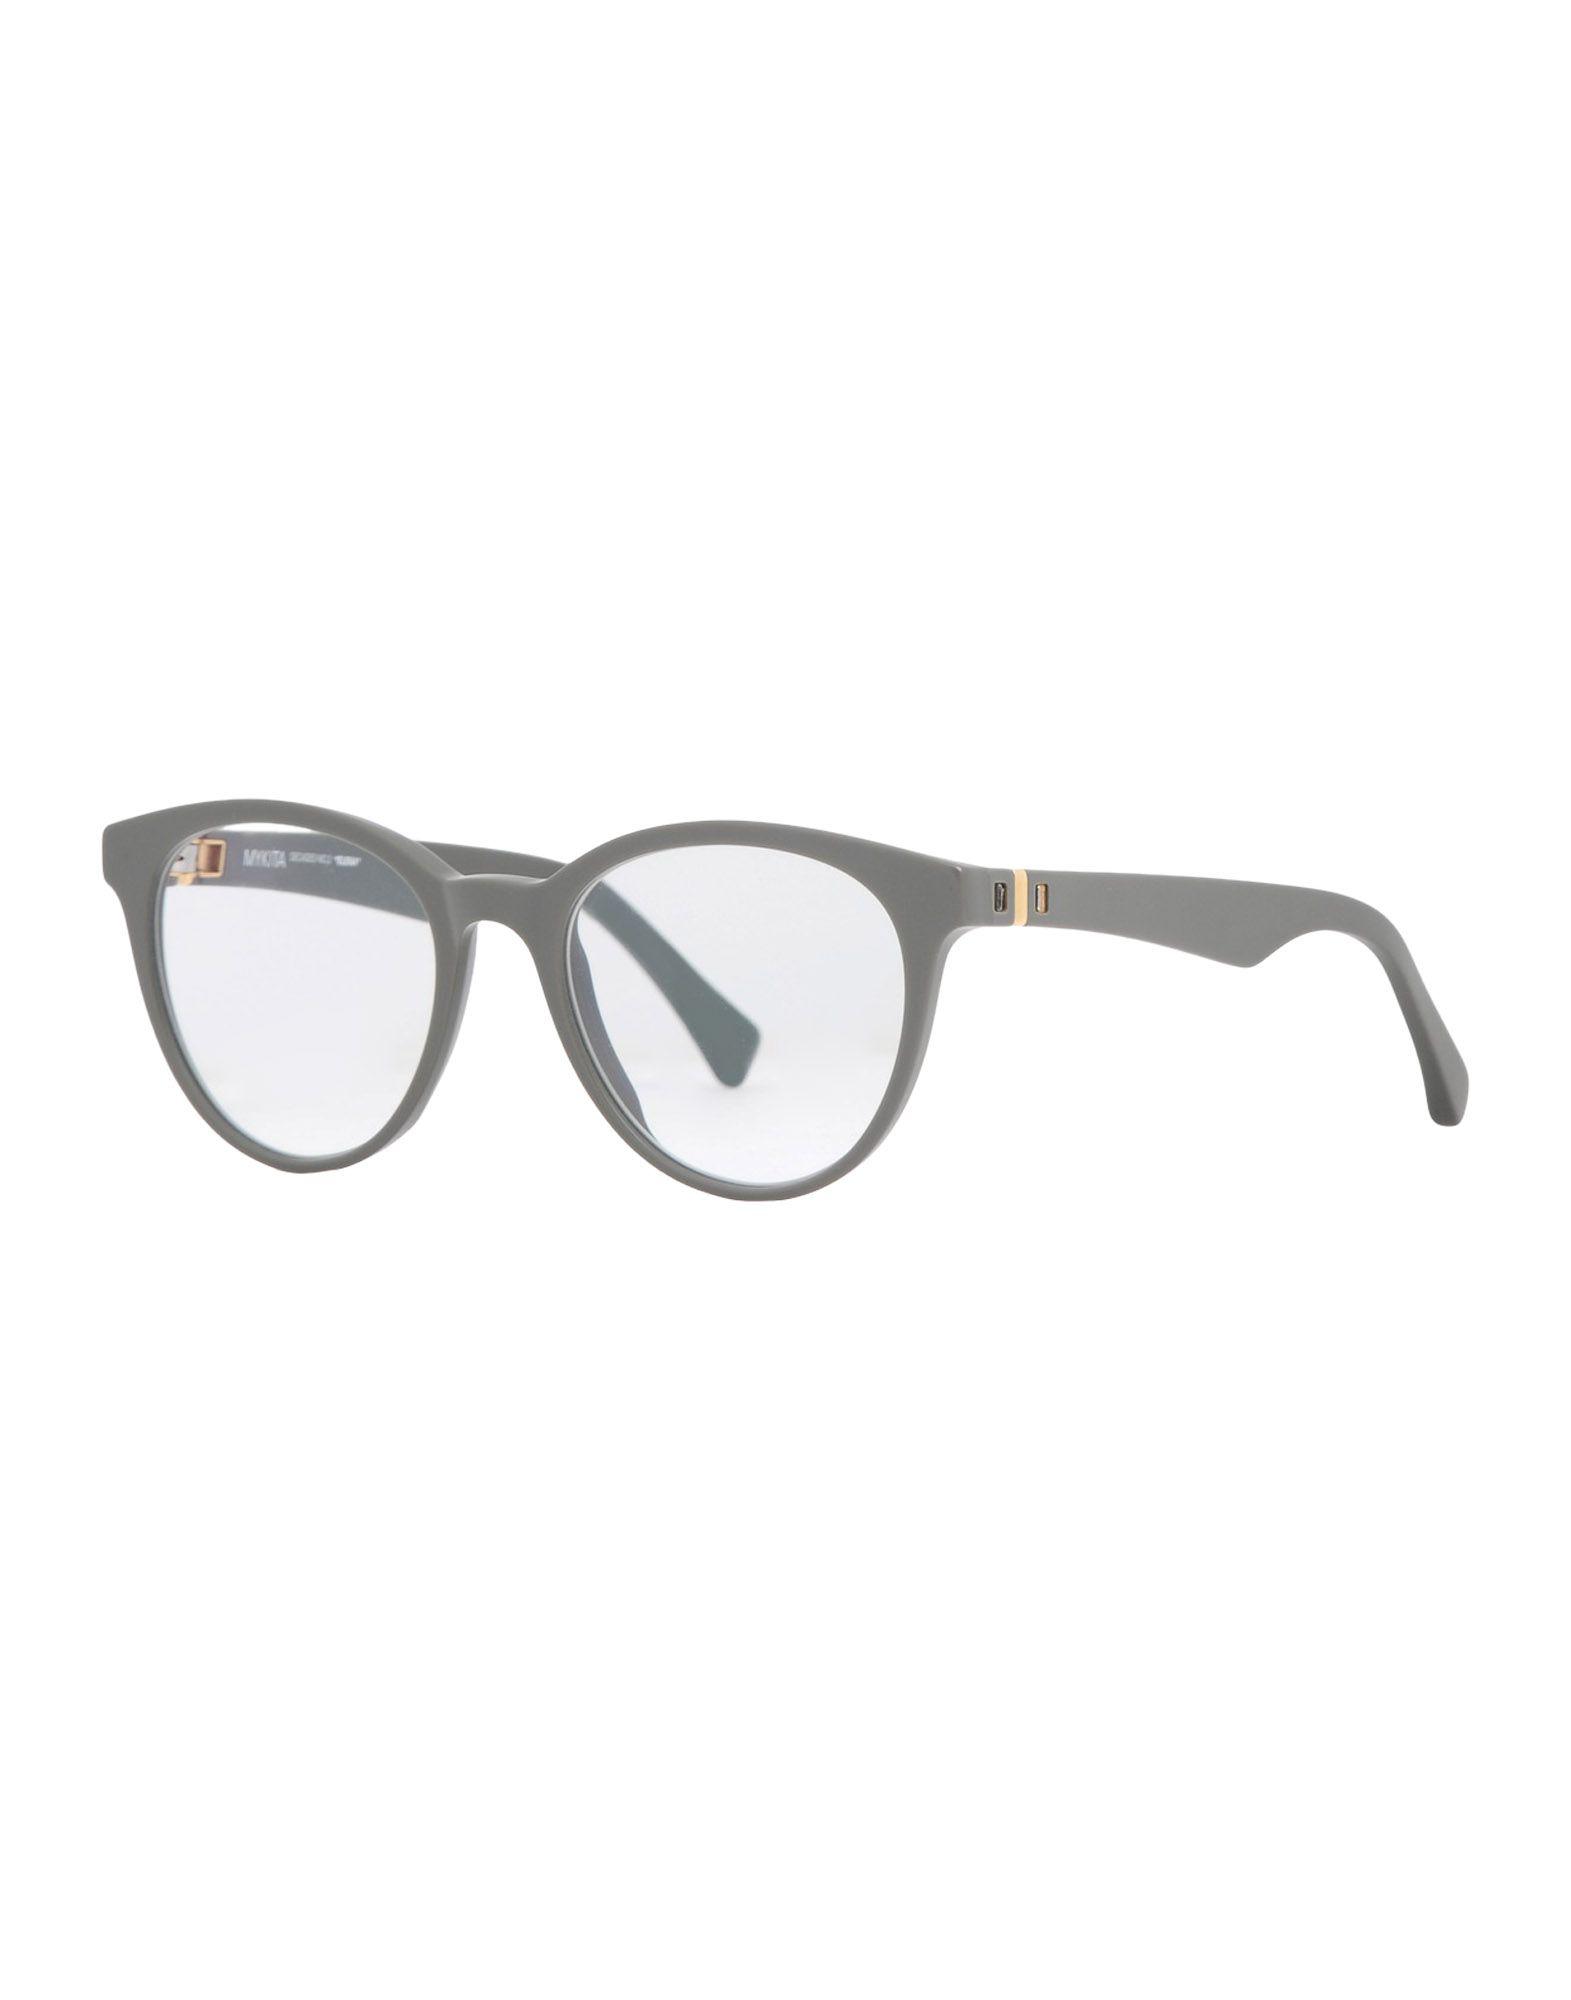 MYKITA Damen Brille Farbe Grau Größe 14